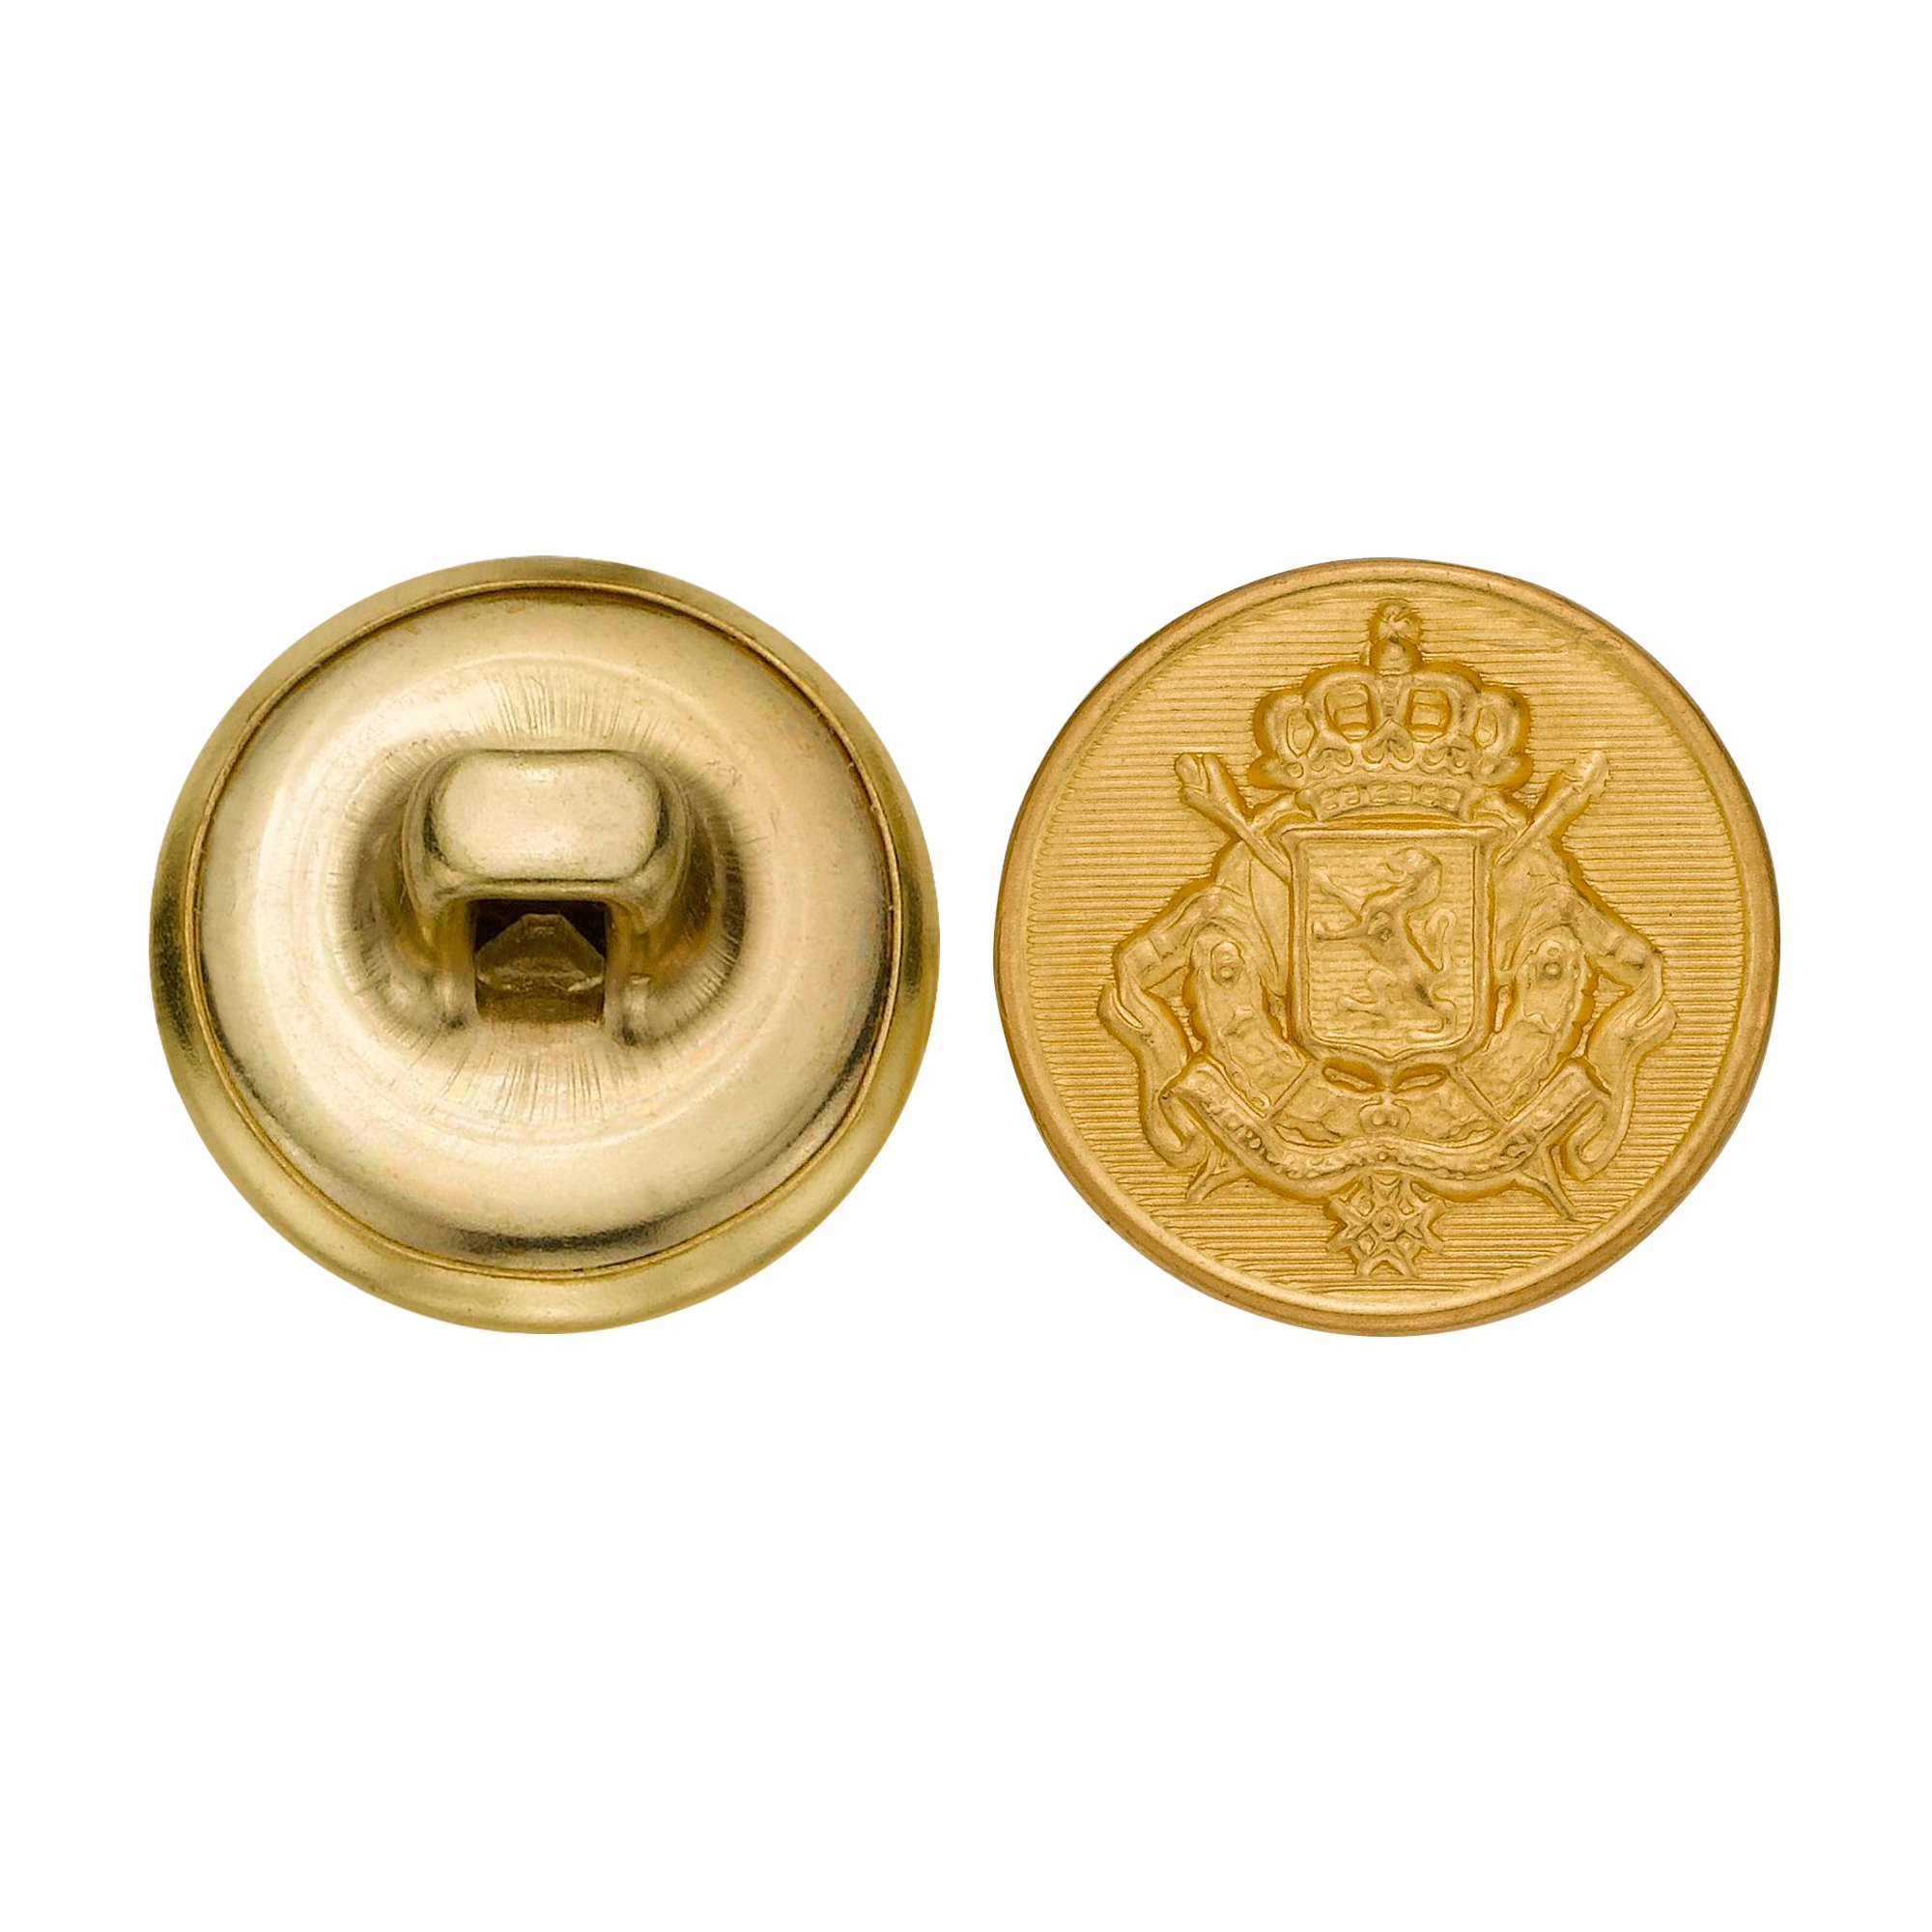 C&C Metal Products 5289 Royal Crest Metal Button, Size 24 Ligne, Gold, 72-Pack